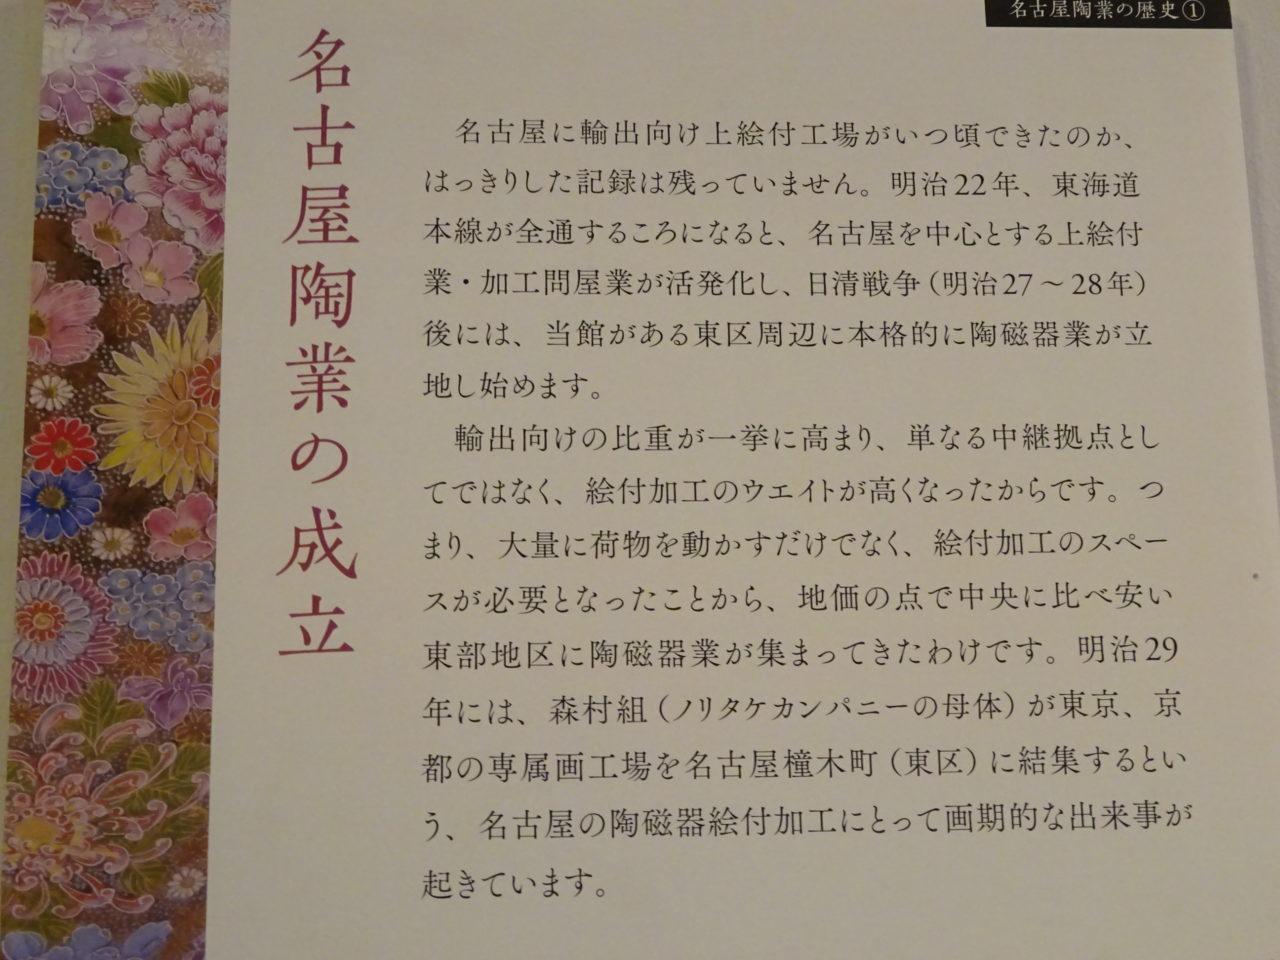 名古屋陶磁器会館の説明